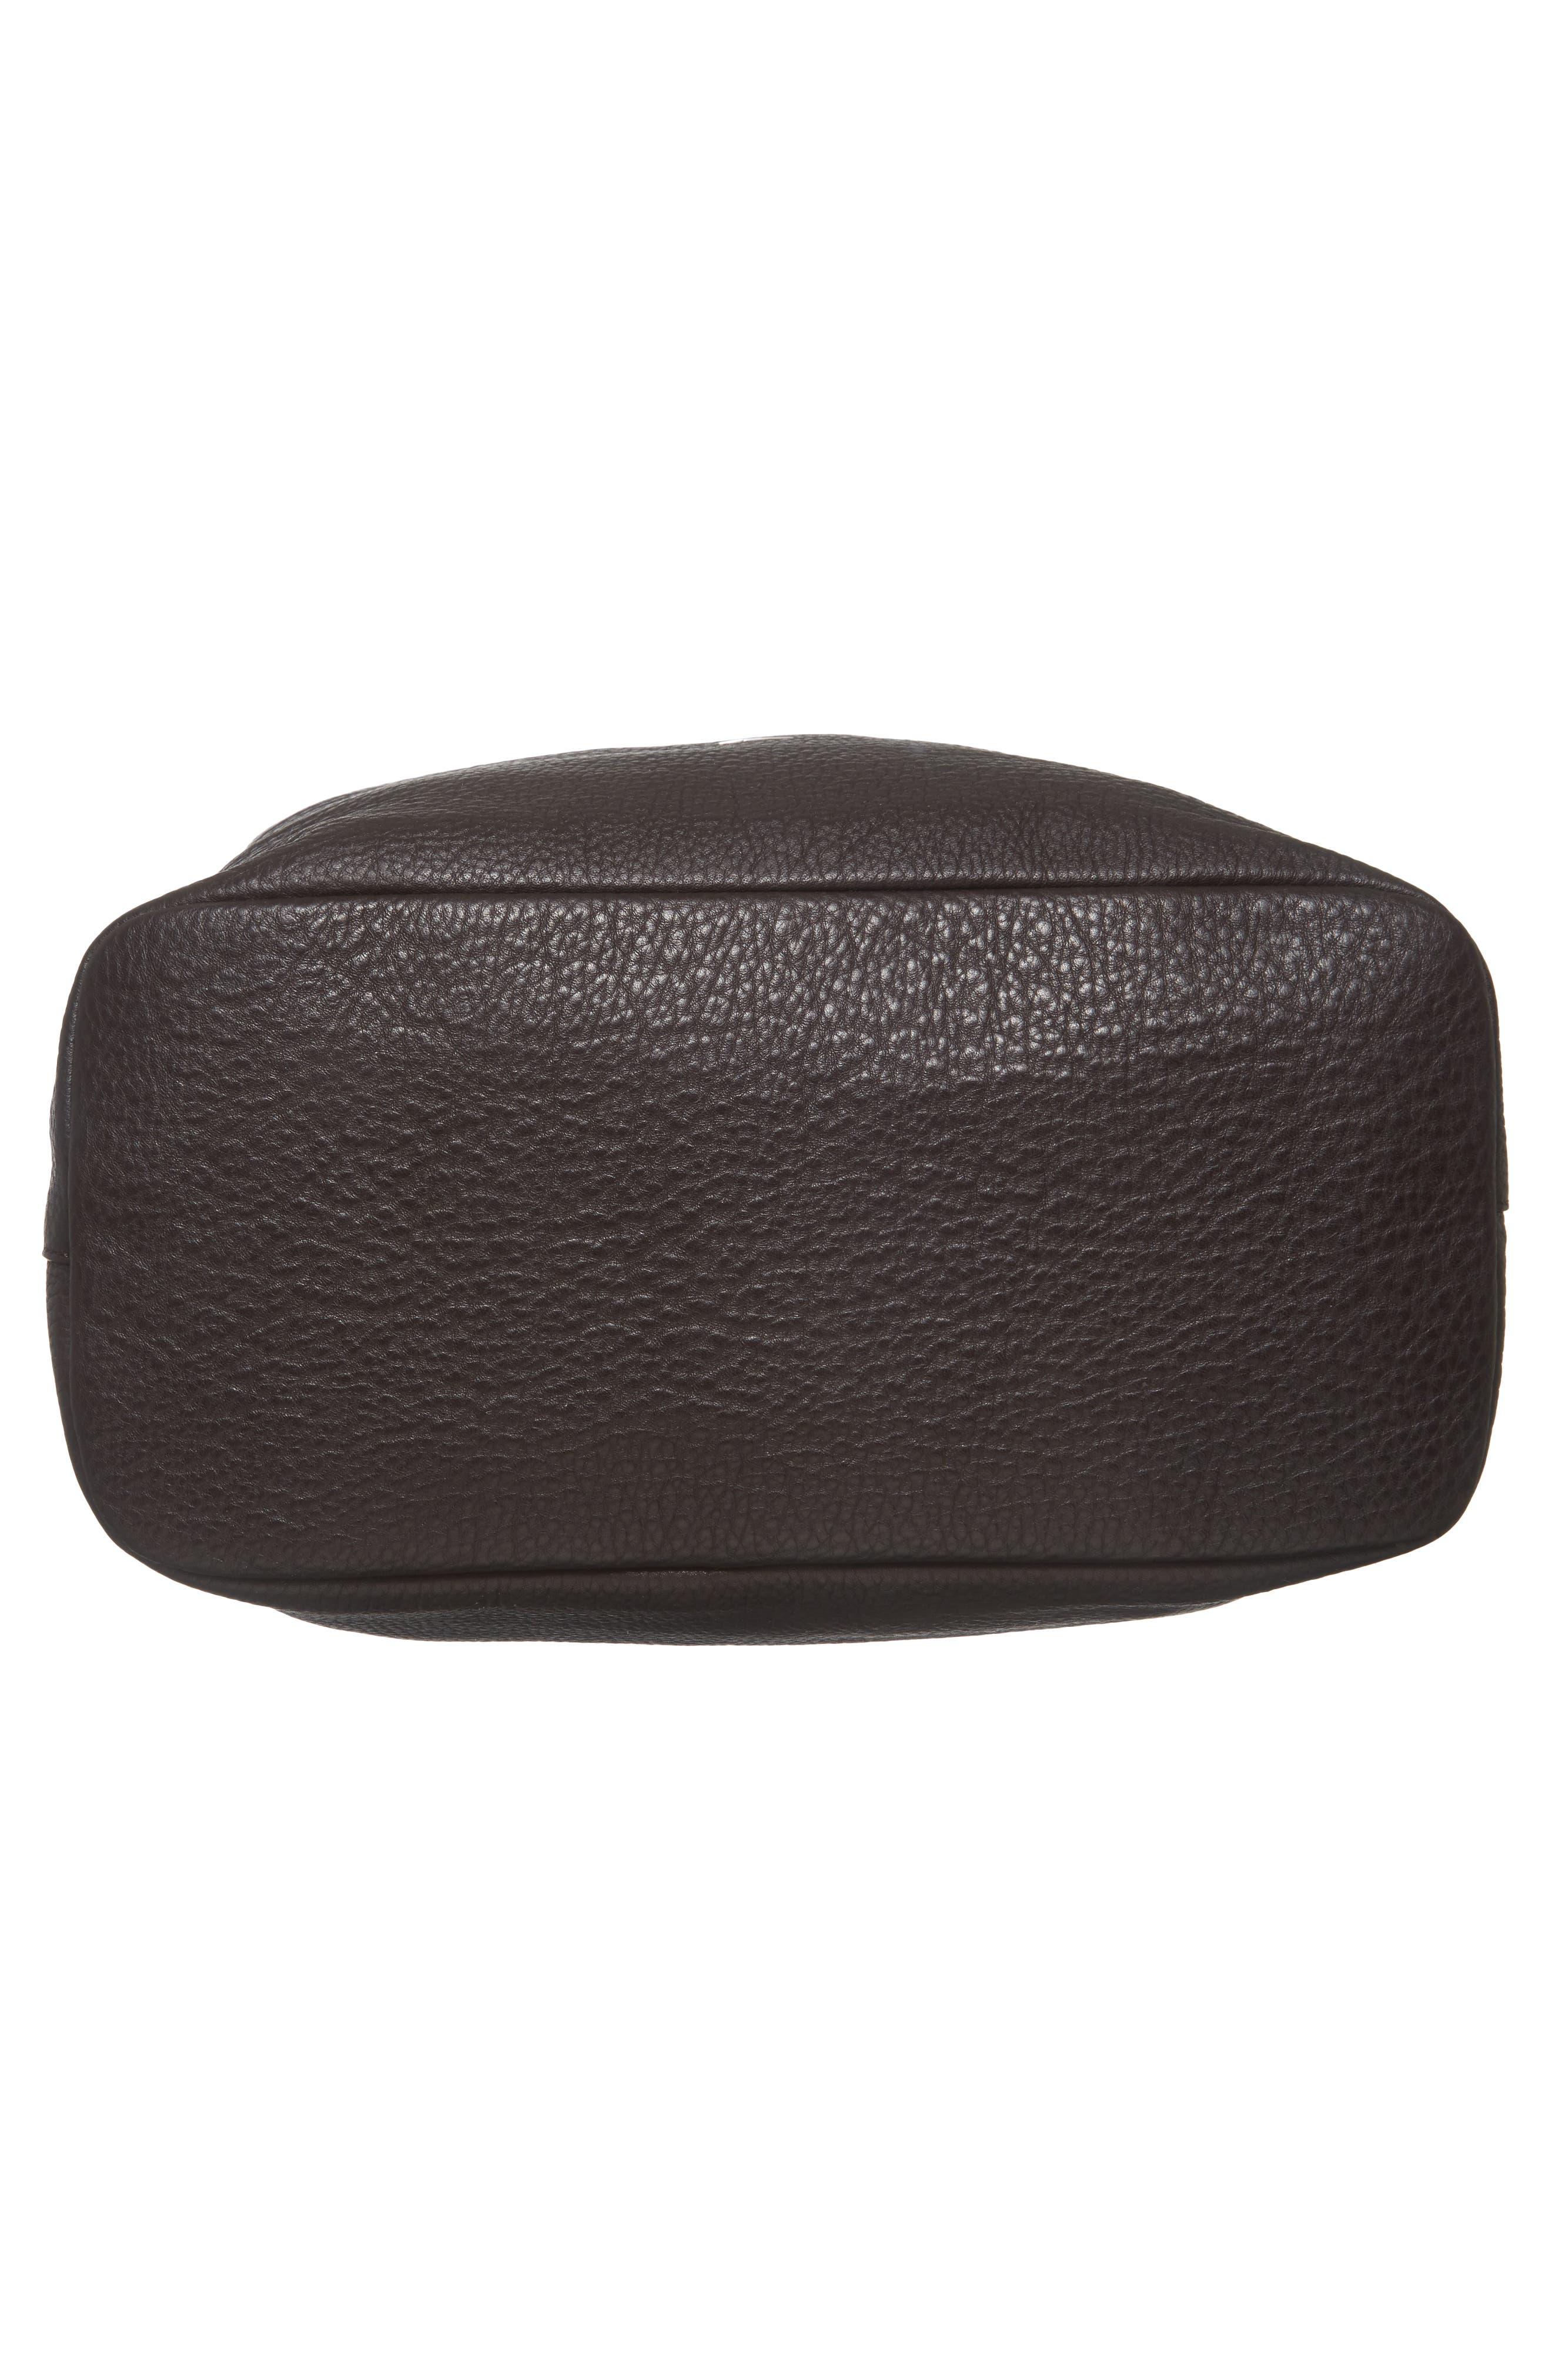 Alternate Image 4  - Shinola Relaxed Calfskin Leather Hobo Bag